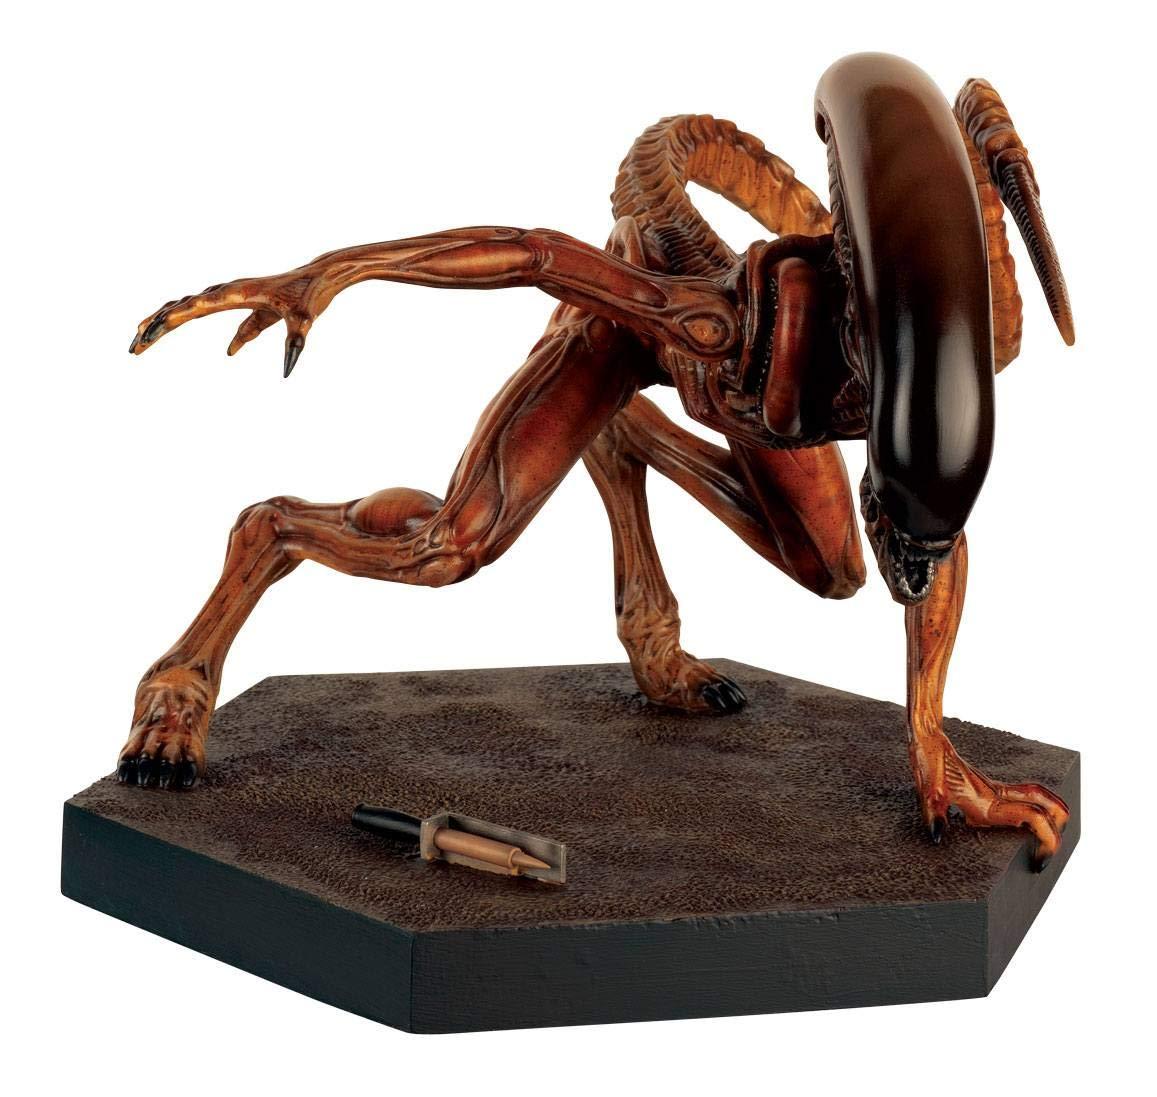 Diamond Mega Runner Xenomorph Fig 19 cm Alien & Protator Figurine Collection  10 Aliens 3 Farbe (DIAAL182528